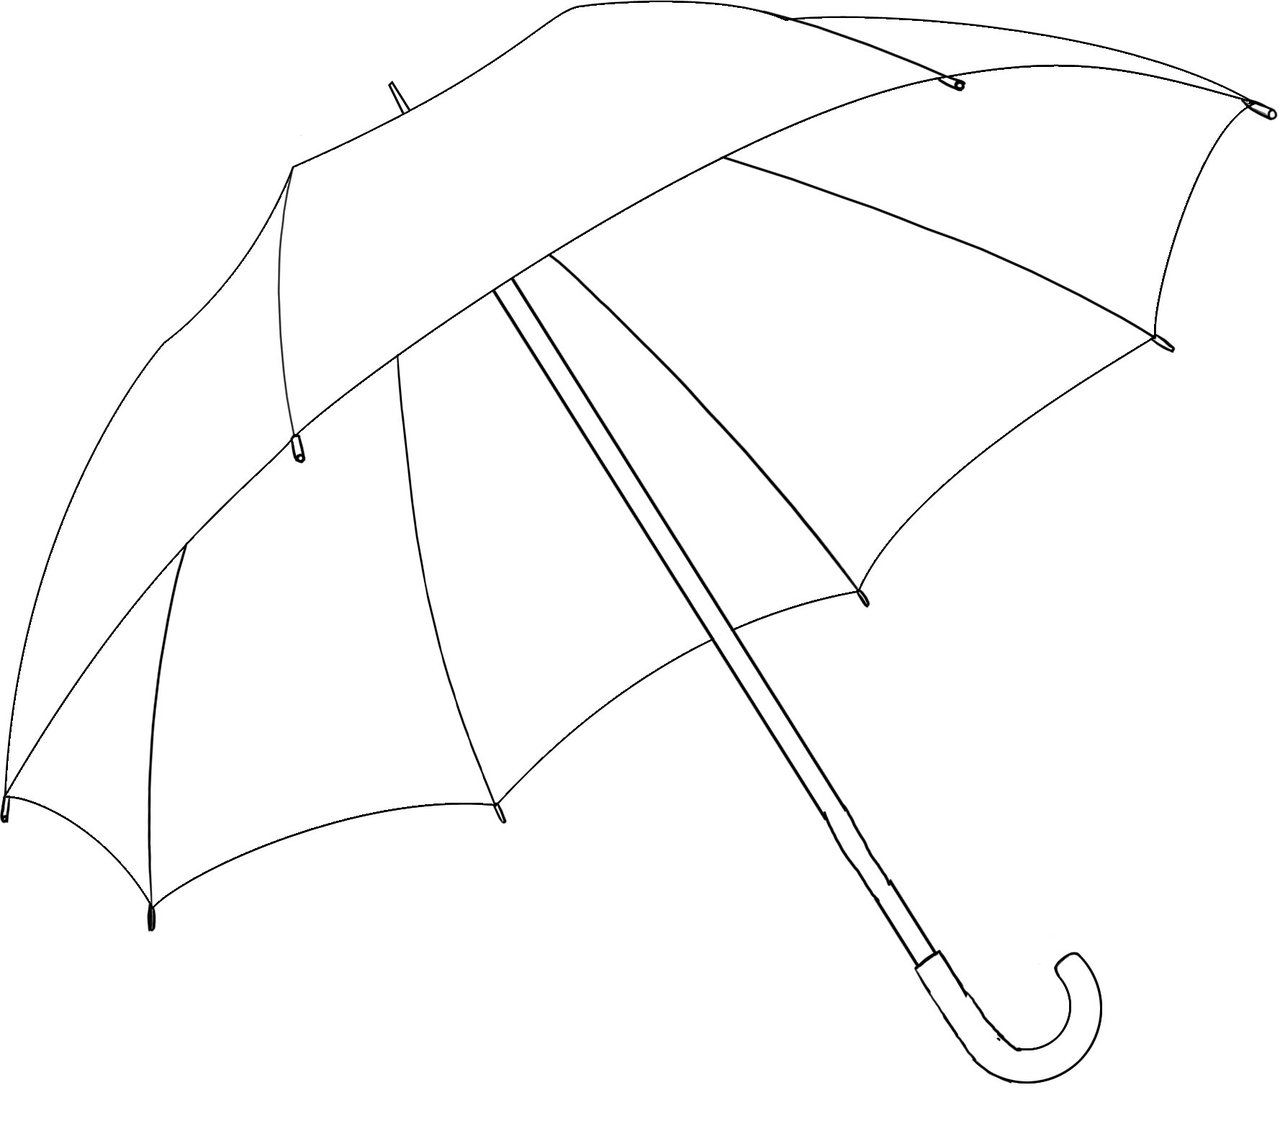 Line Art Umbrella : Umbrella drawing at getdrawings free for personal